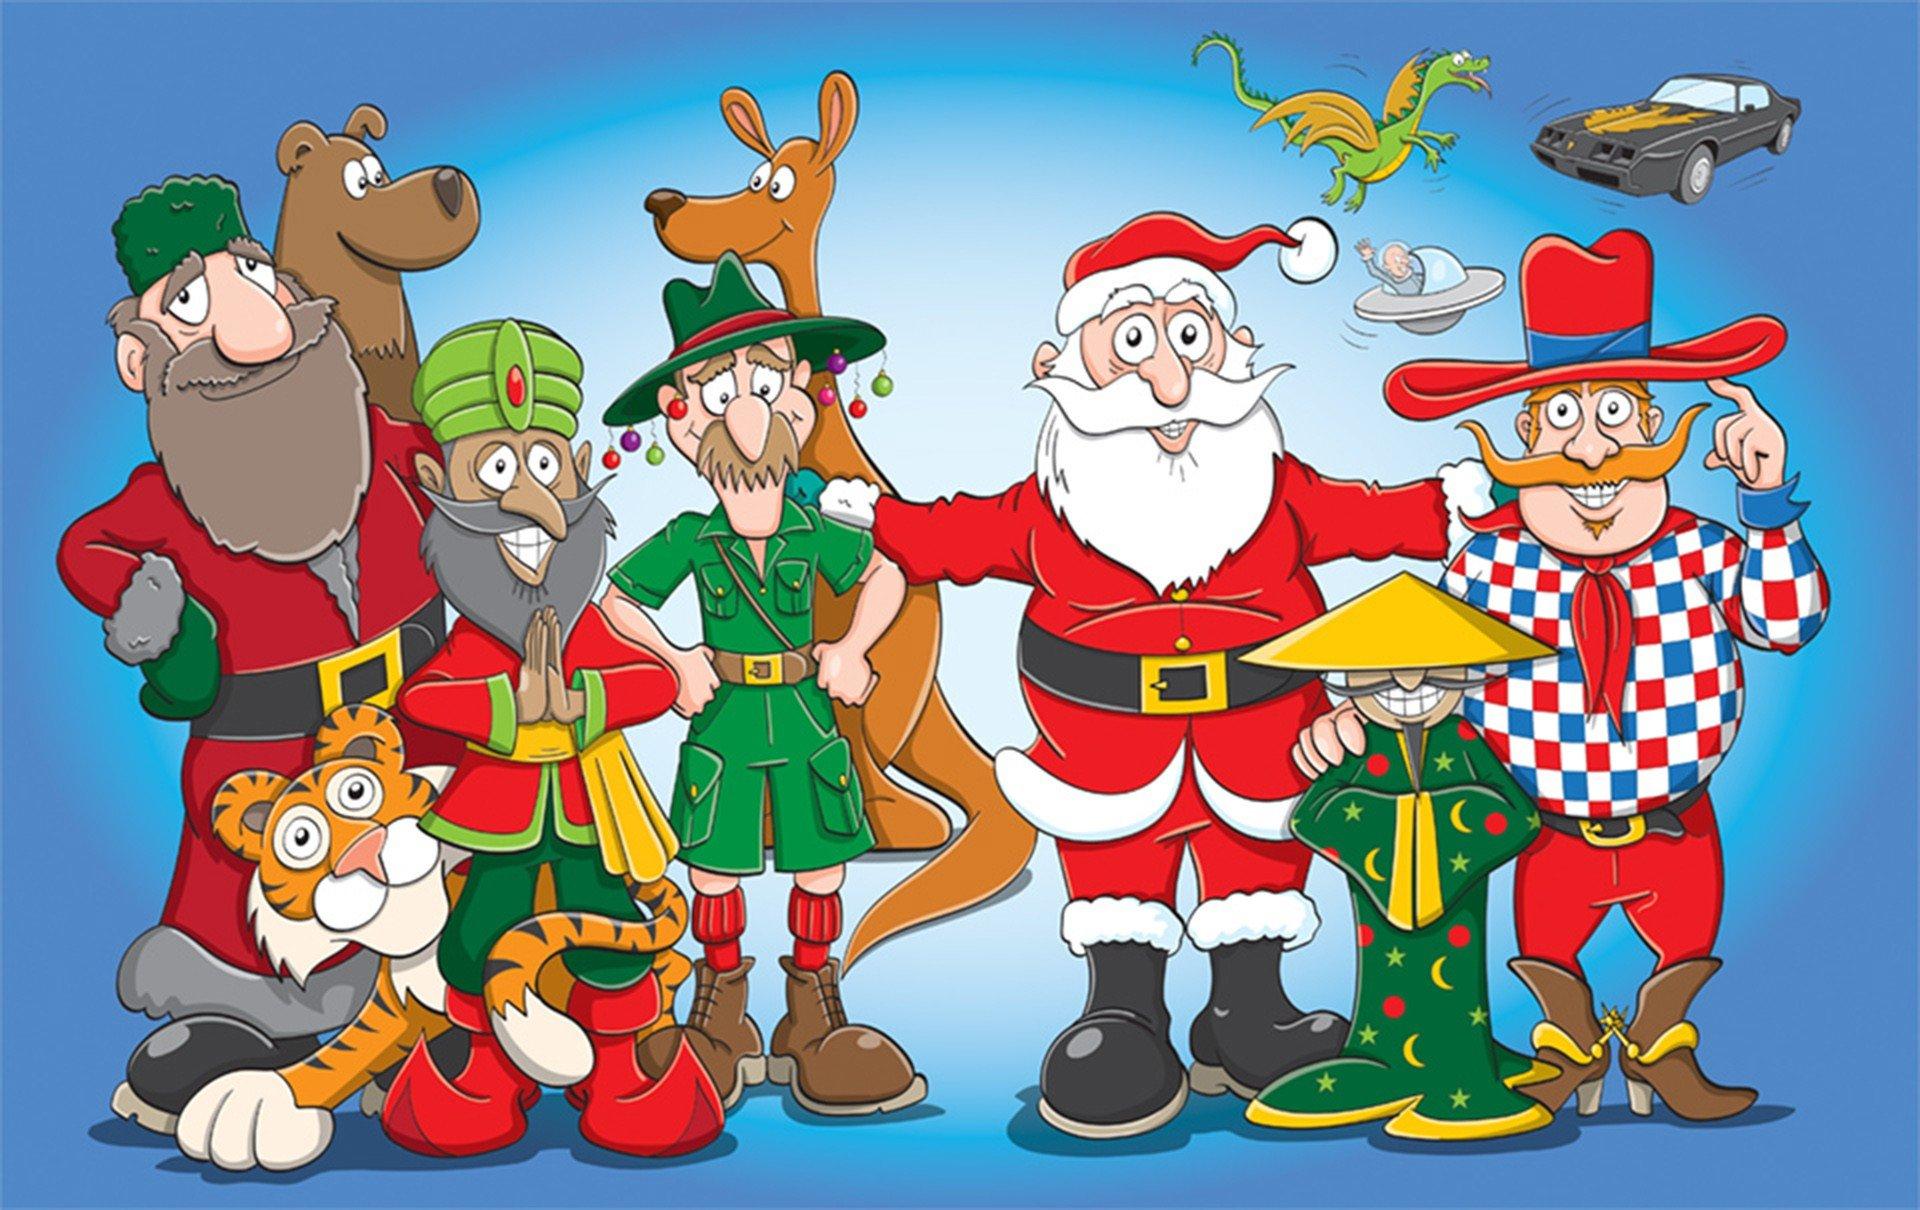 The Santa Corps